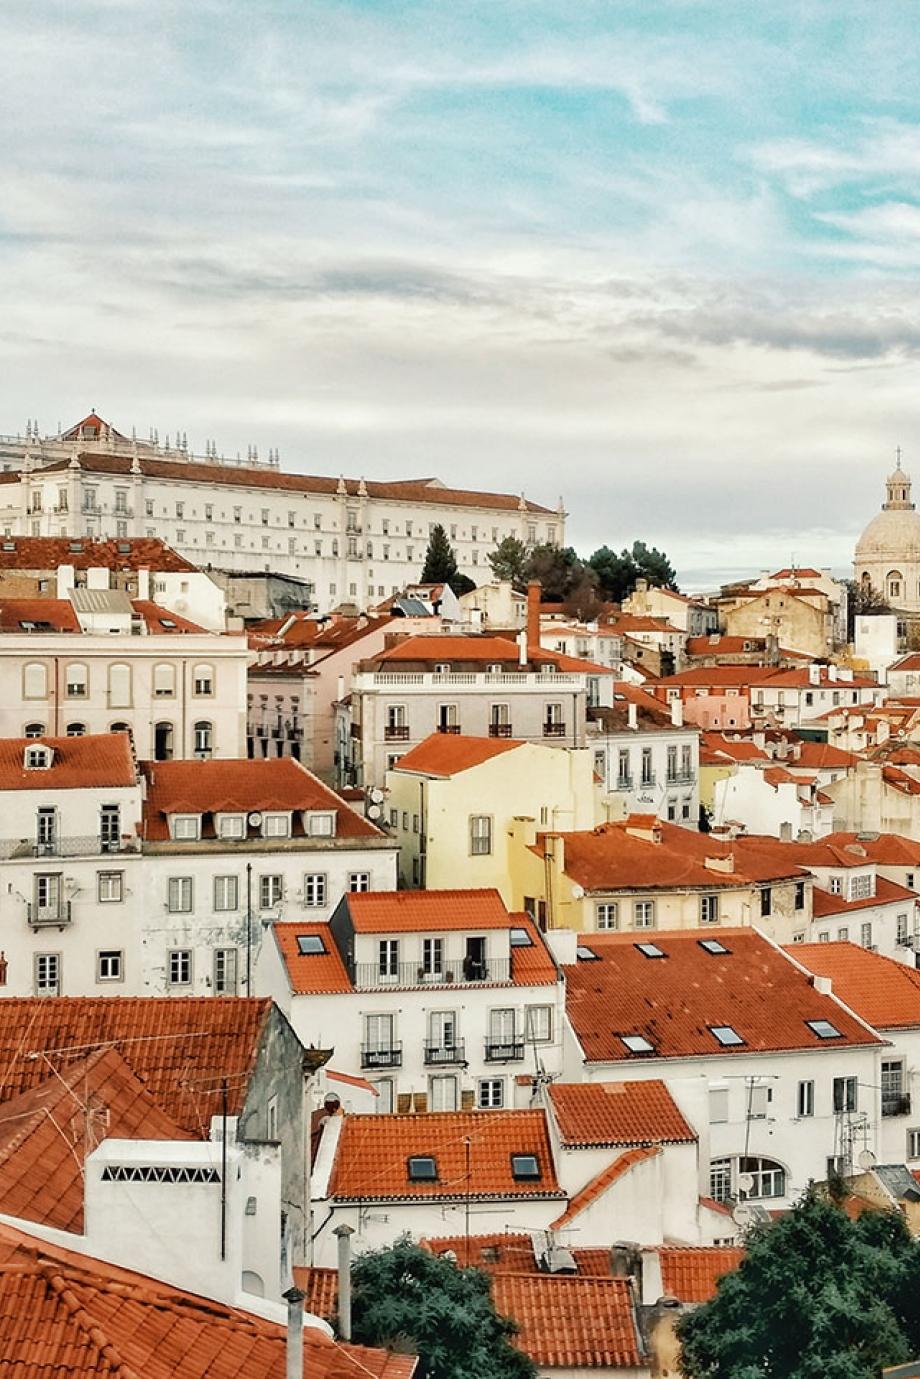 LisboaCool_Blog_As ruas mais icónicas de Lisboa